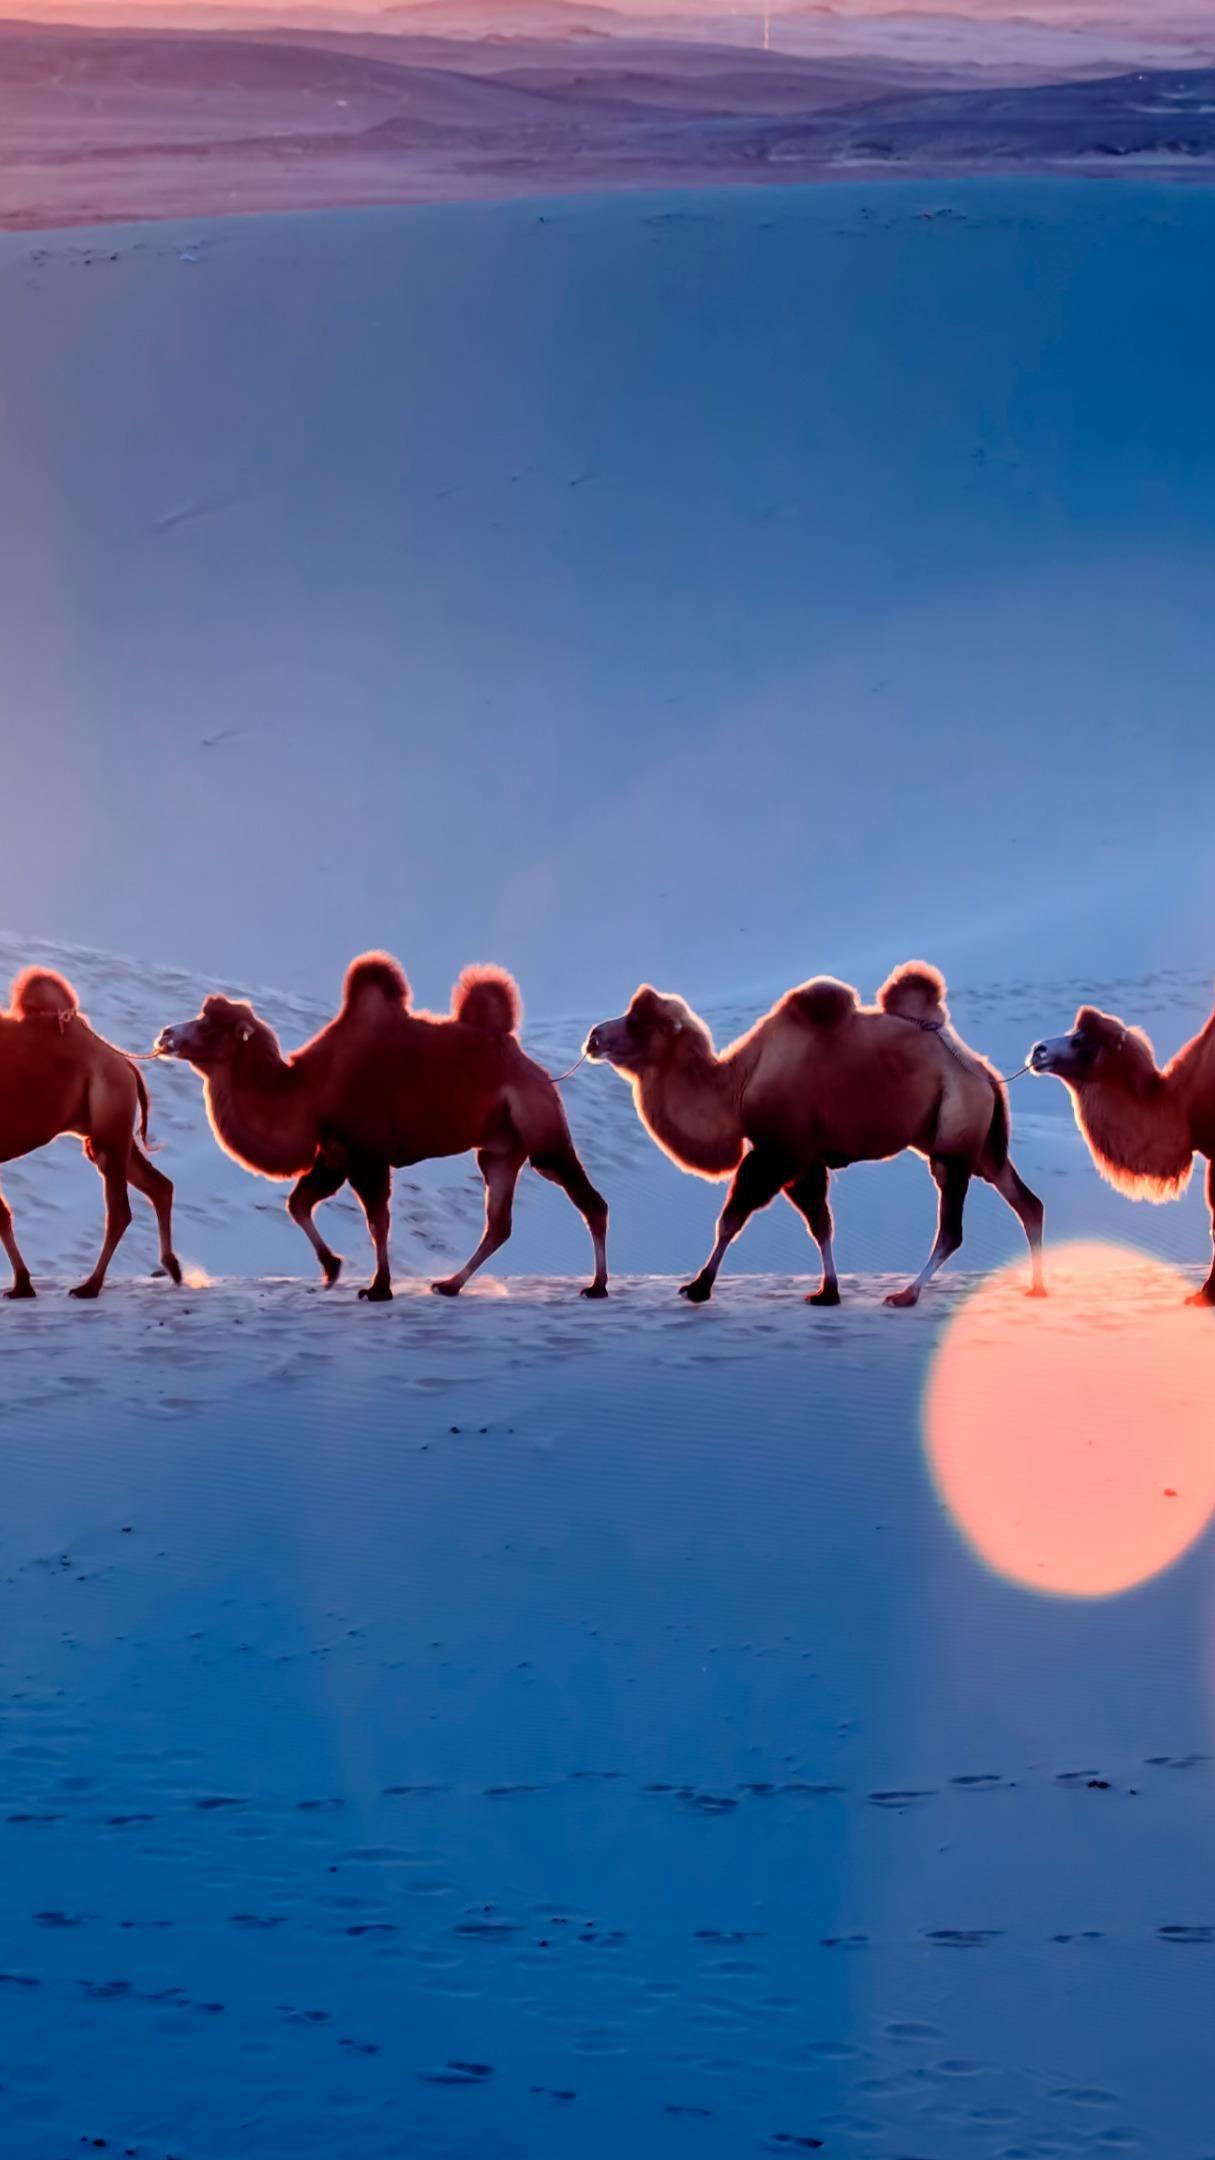 Desert Camel Team 4K UltraHD Wallpaper - backiee